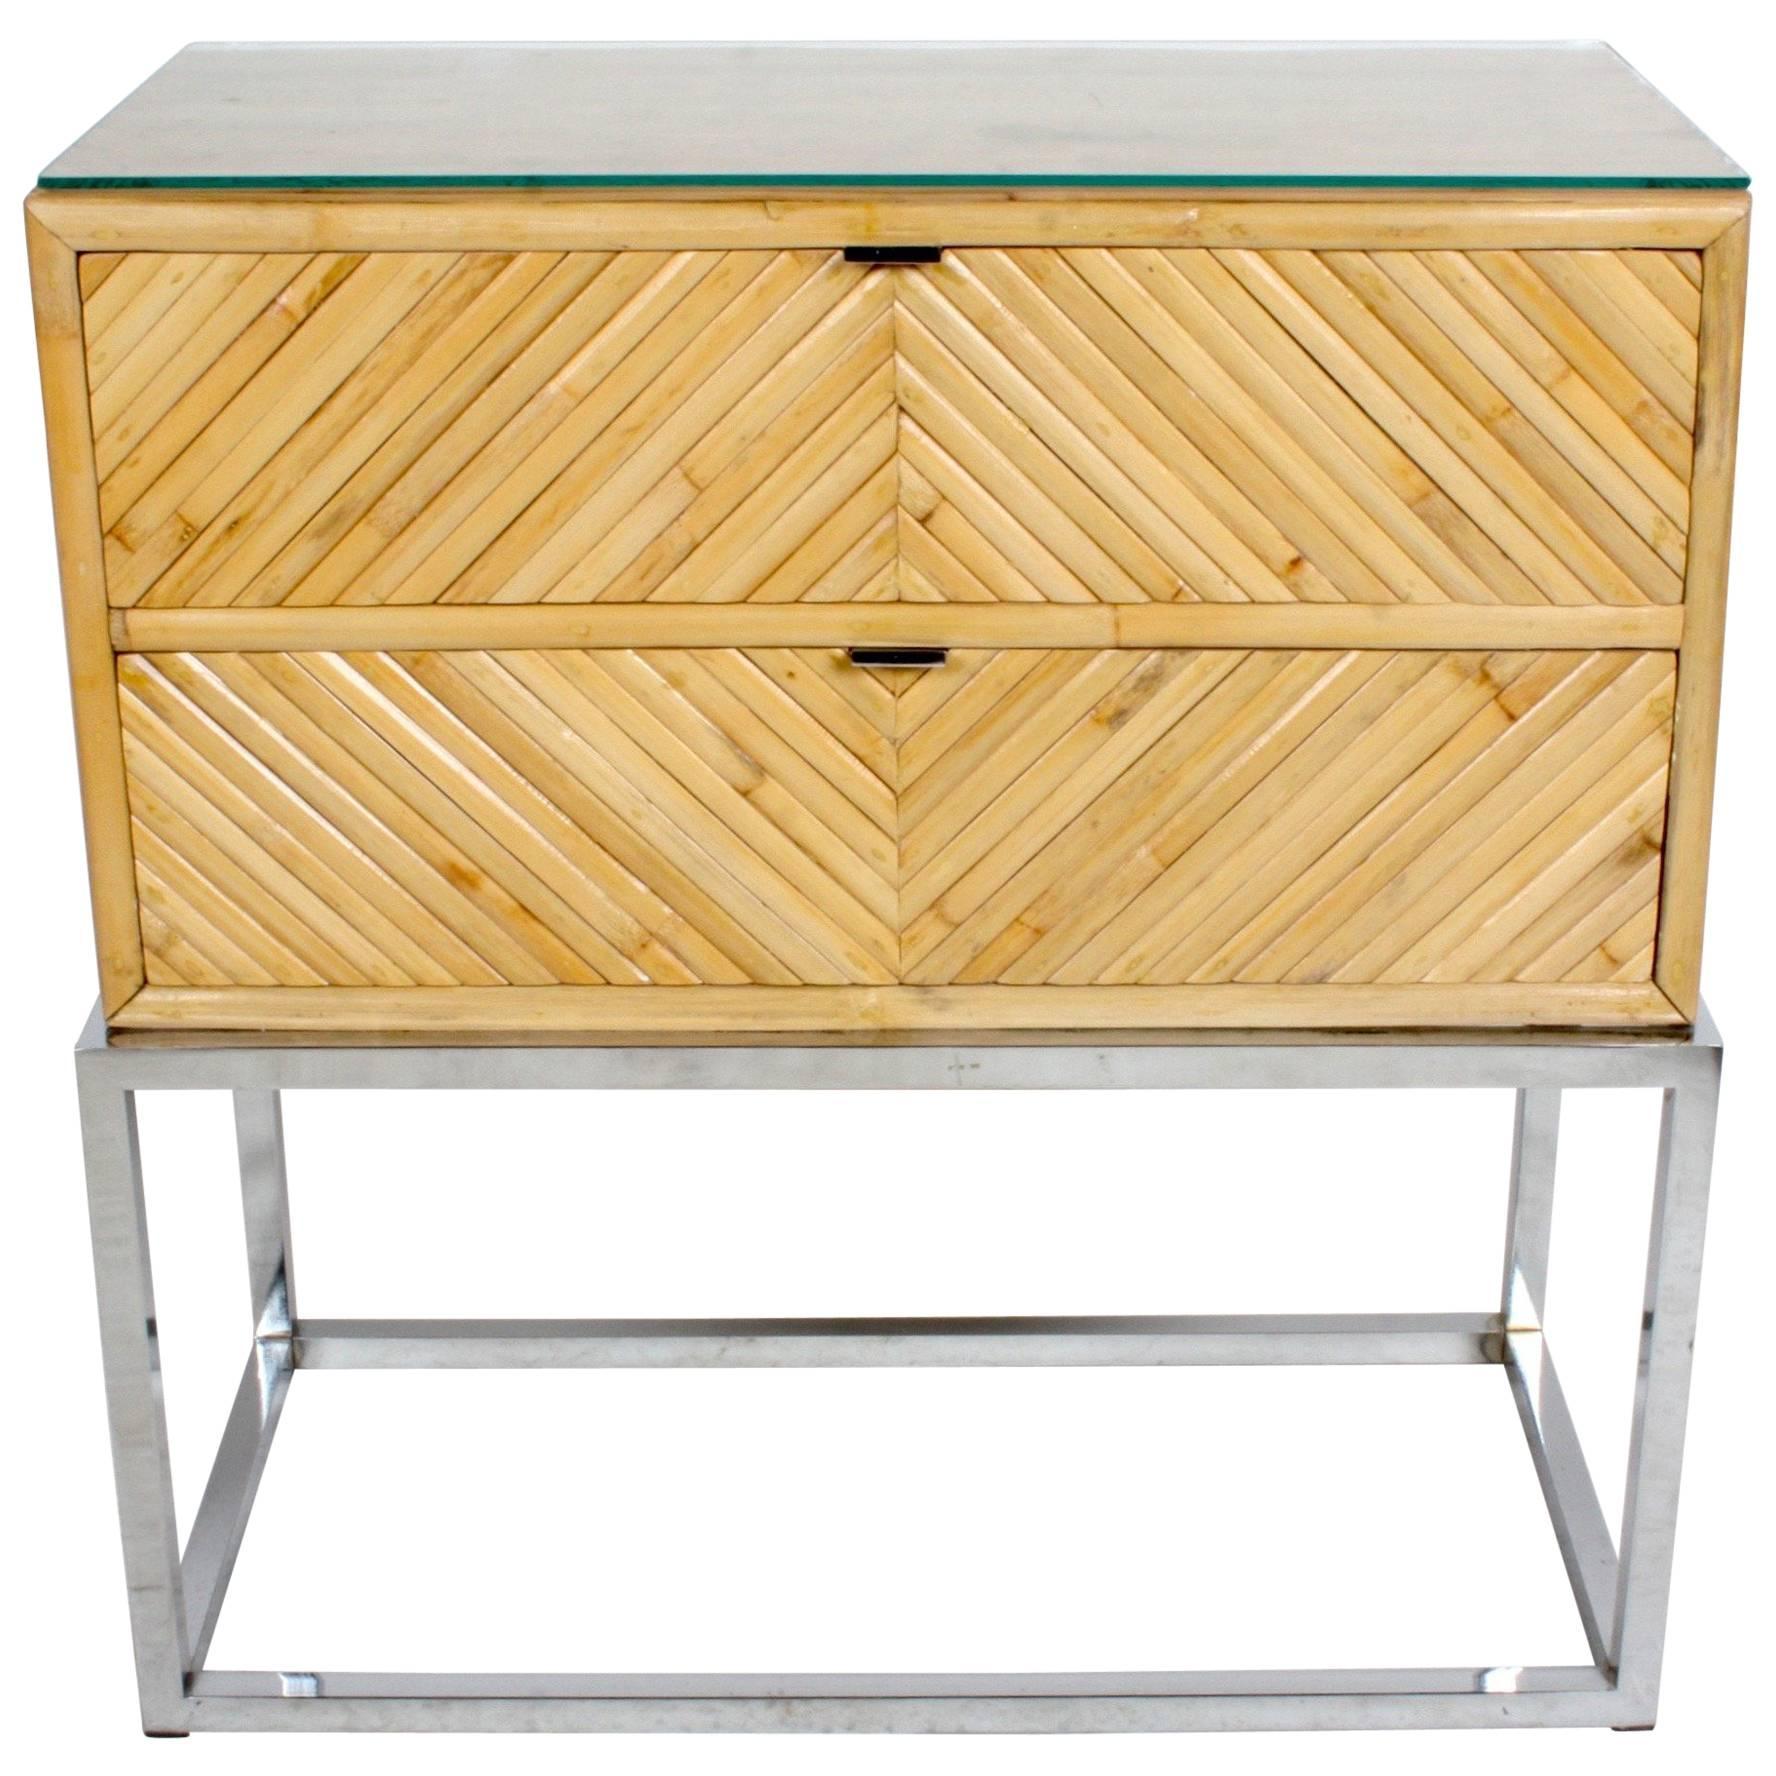 Milo Baughman Style Geometric Bamboo End Table or Nightstand